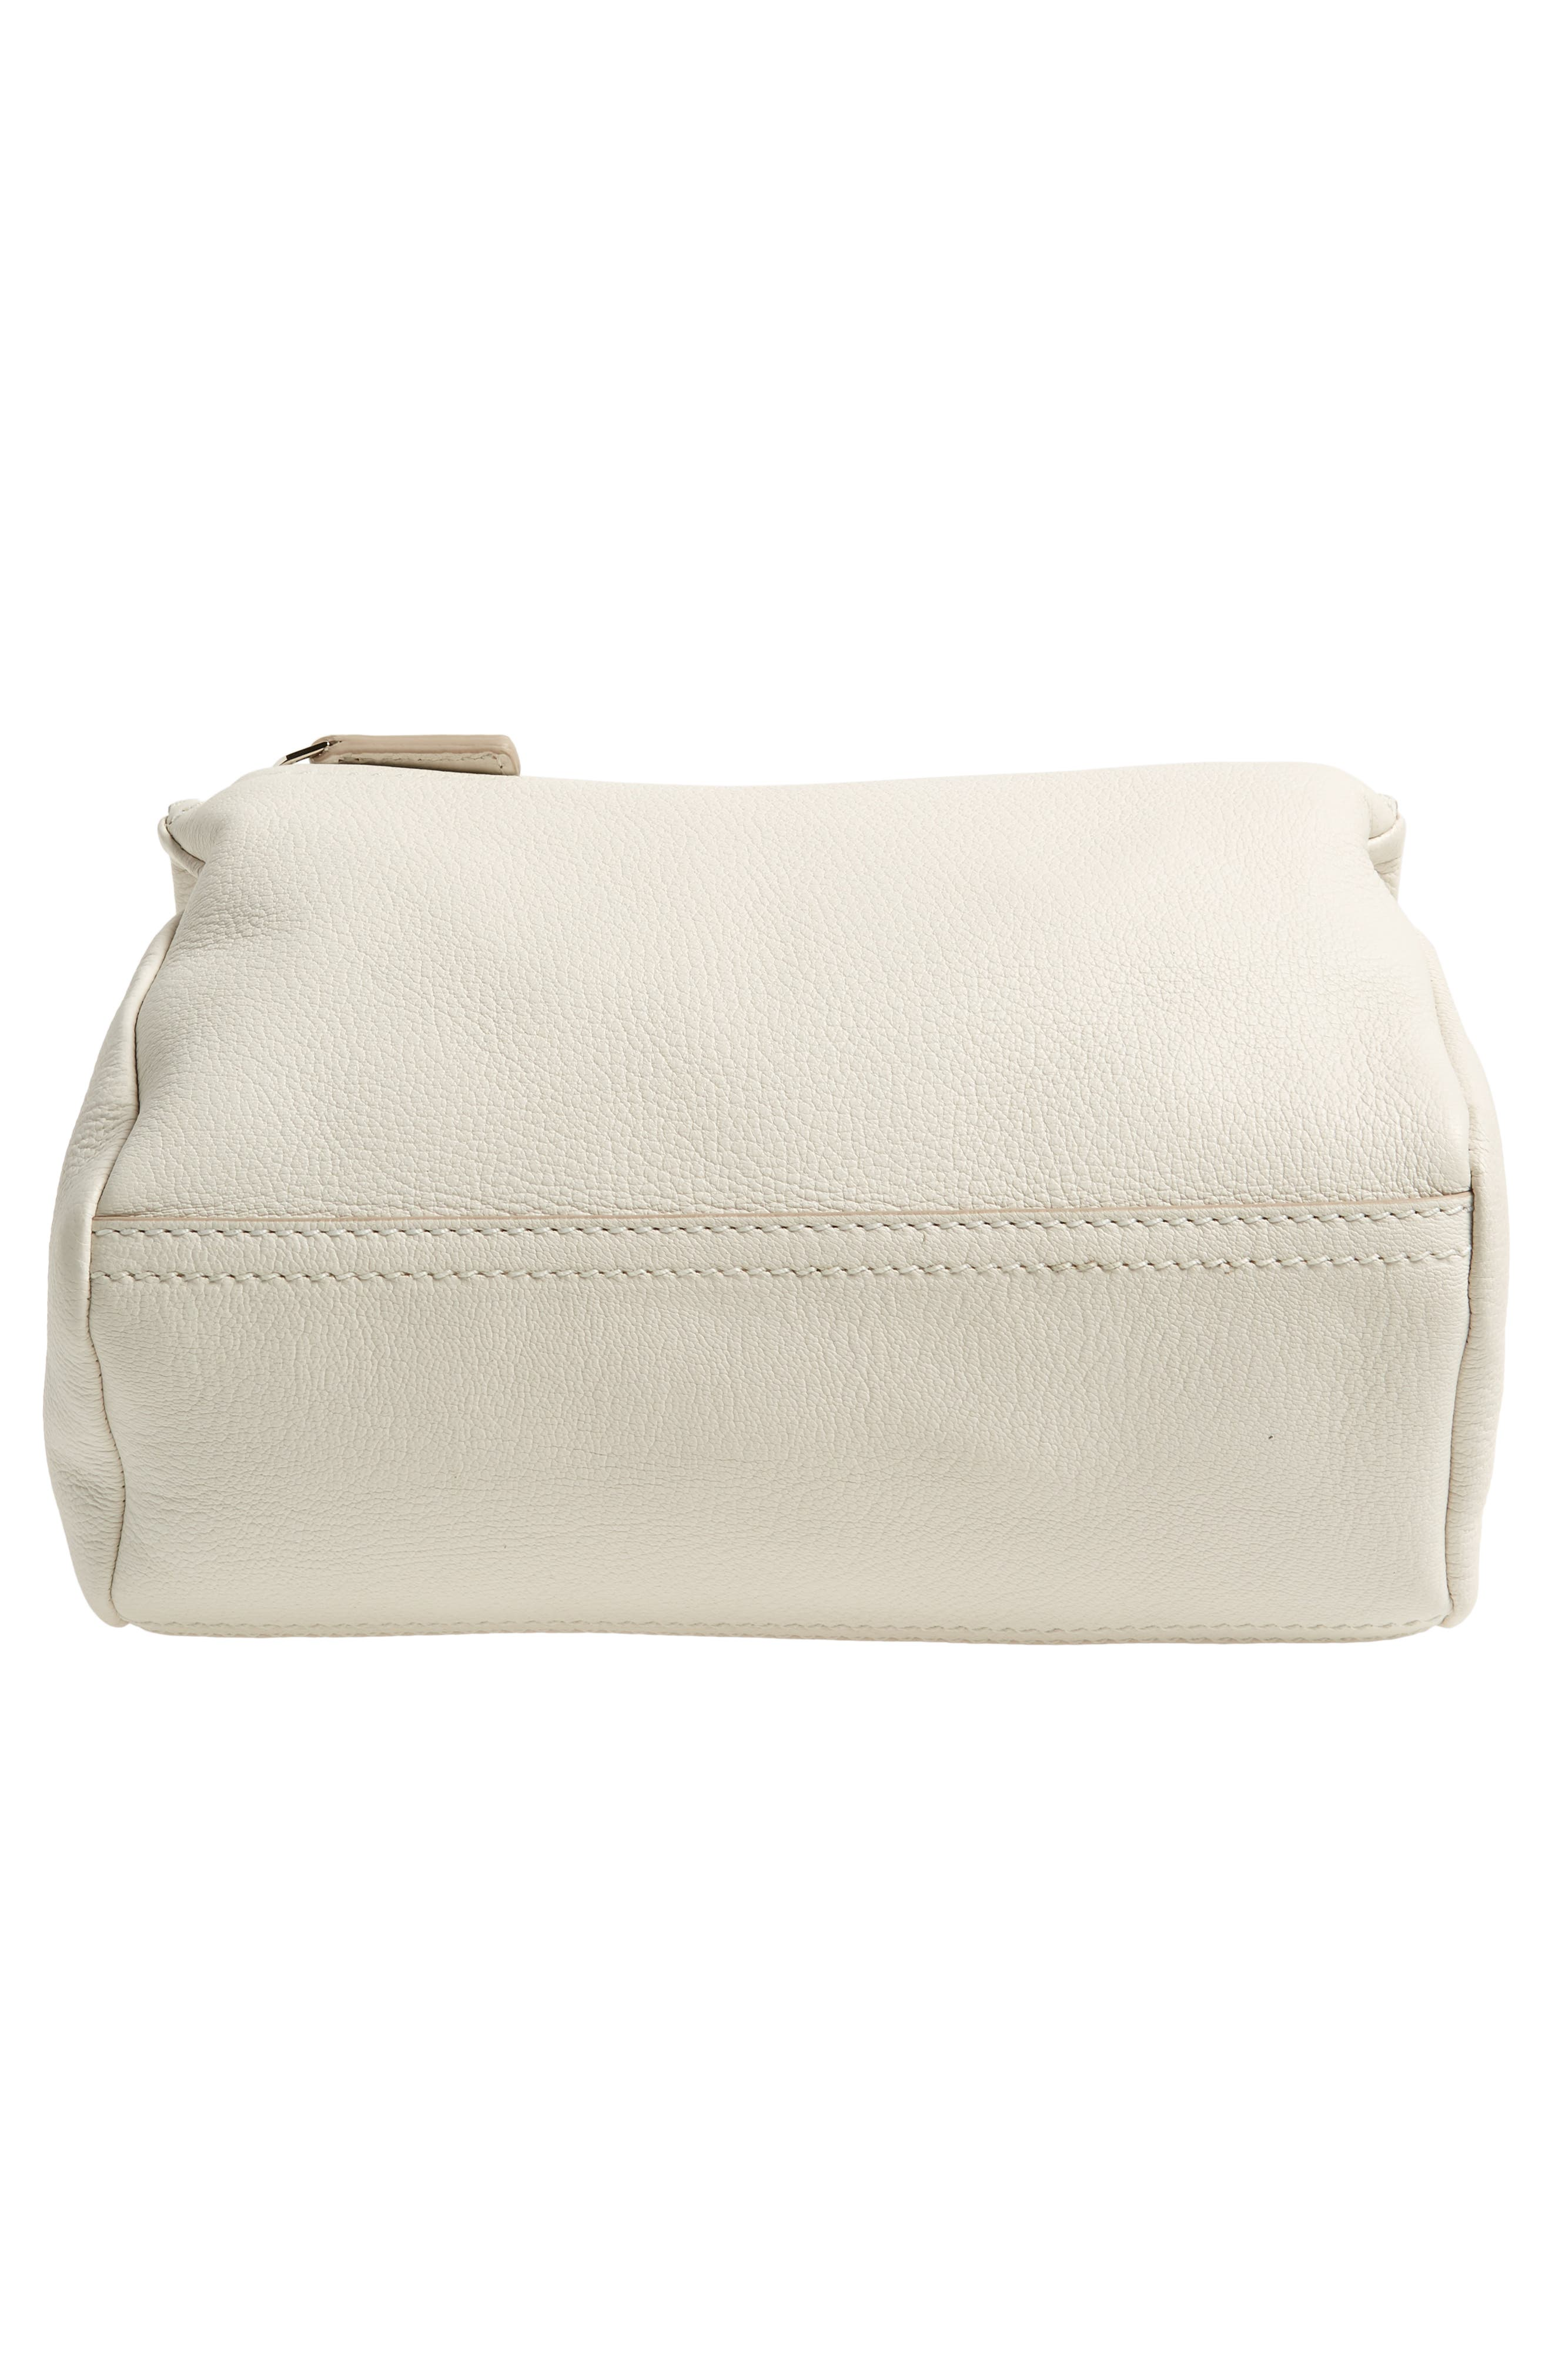 'Mini Pandora' Sugar Leather Shoulder Bag,                             Alternate thumbnail 6, color,                             WHITE